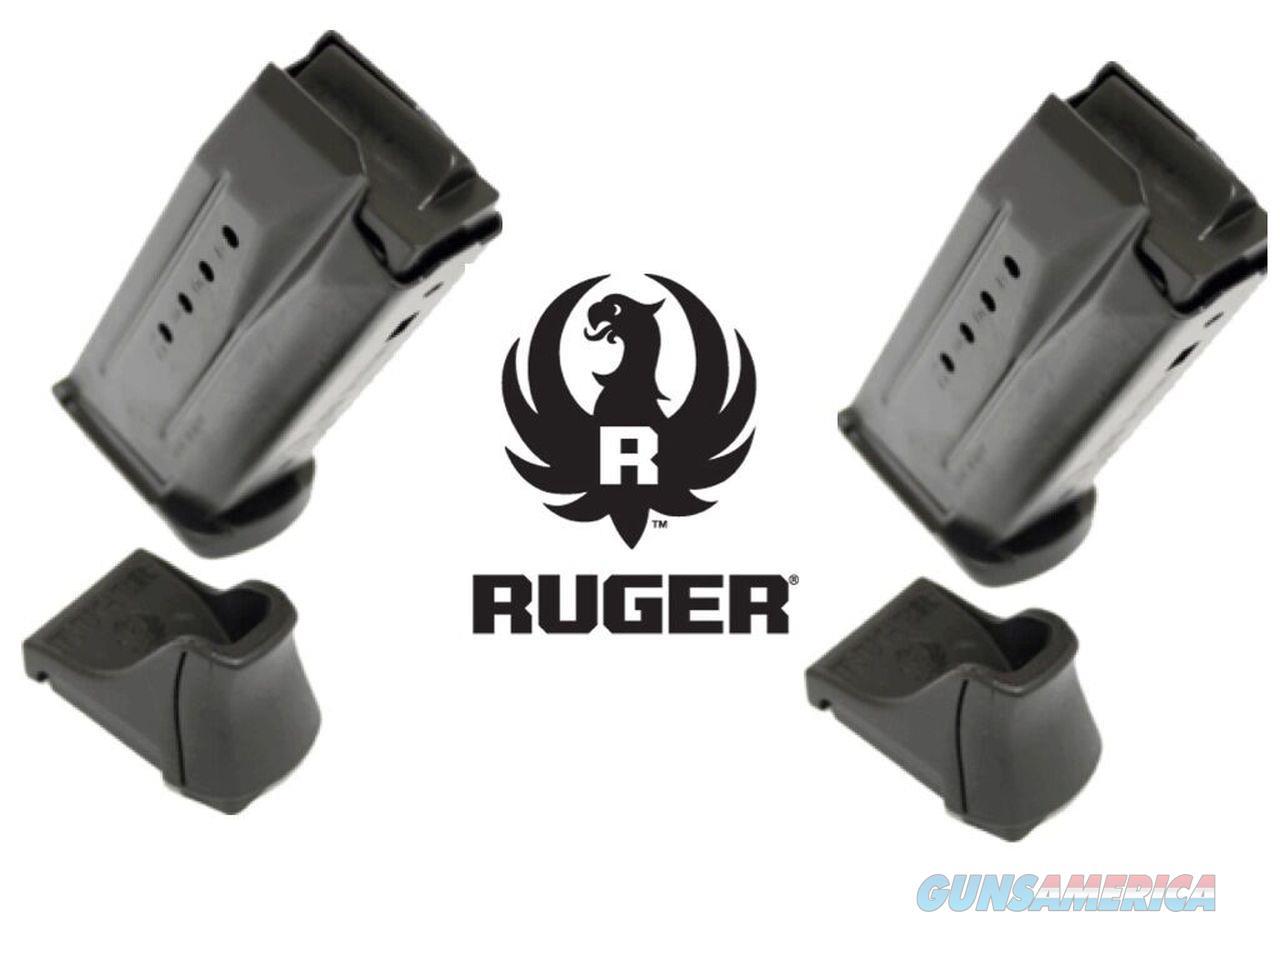 10 Pack Ruger SR9 C SR9C 9mm Magazine 9 mm 10 Round Mag Magazines Compact Pinkie  Non-Guns > Ammunition